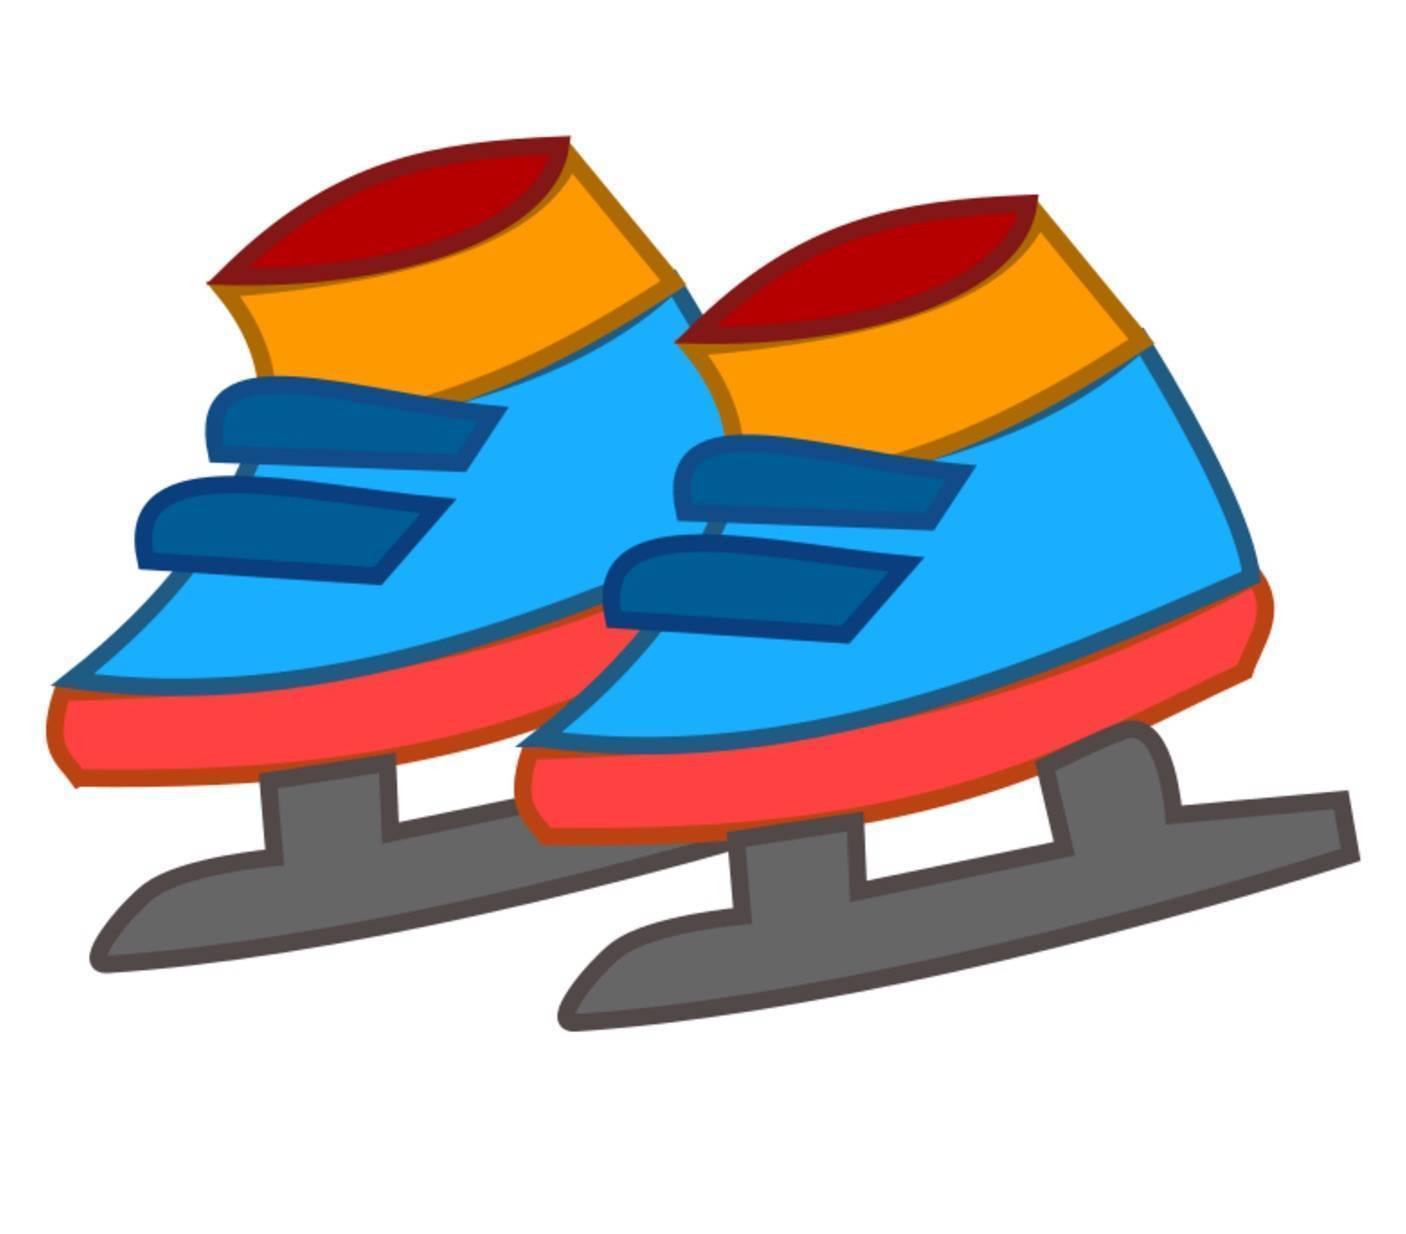 de02b6e6d45af75ea673_8b09b8d295564d63be5b_ice_skating.jpg